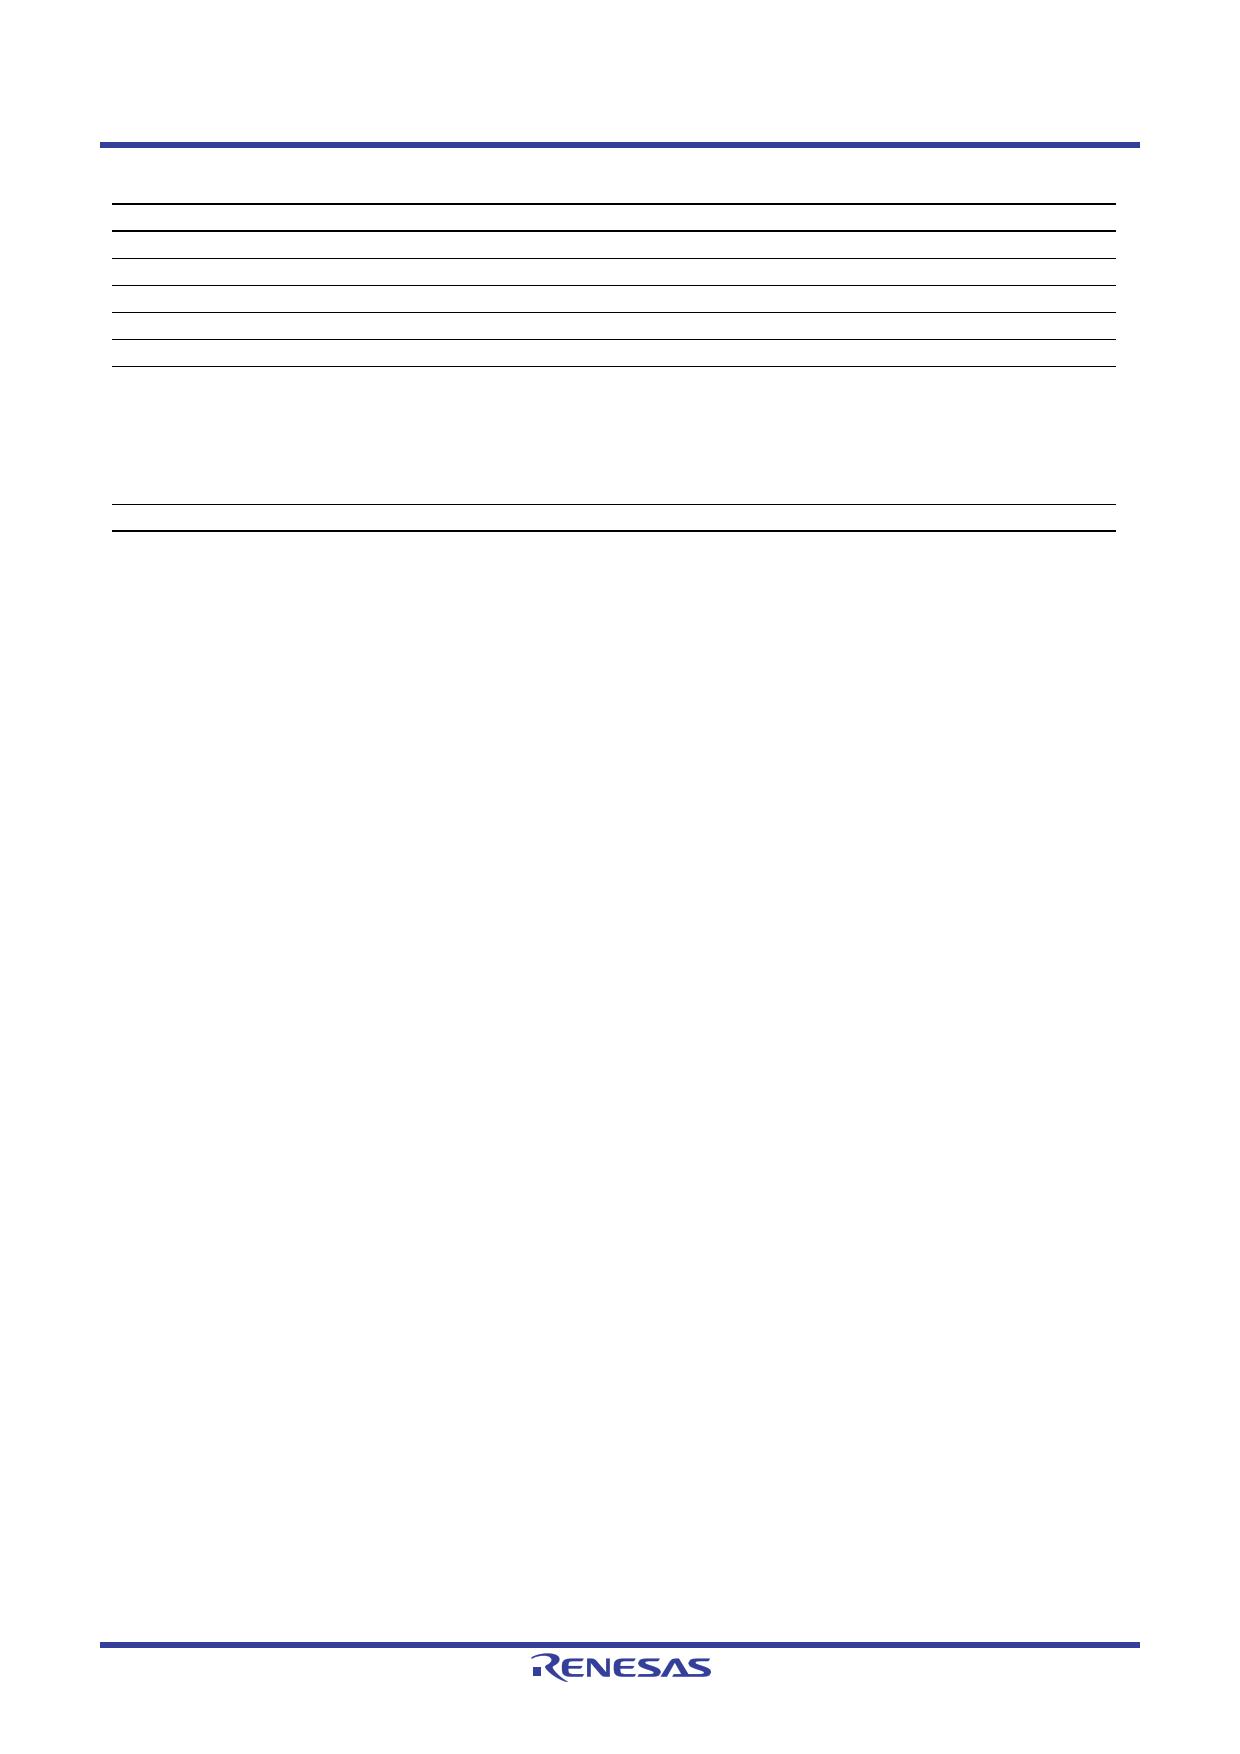 R5F51103ADFK pdf, 반도체, 판매, 대치품